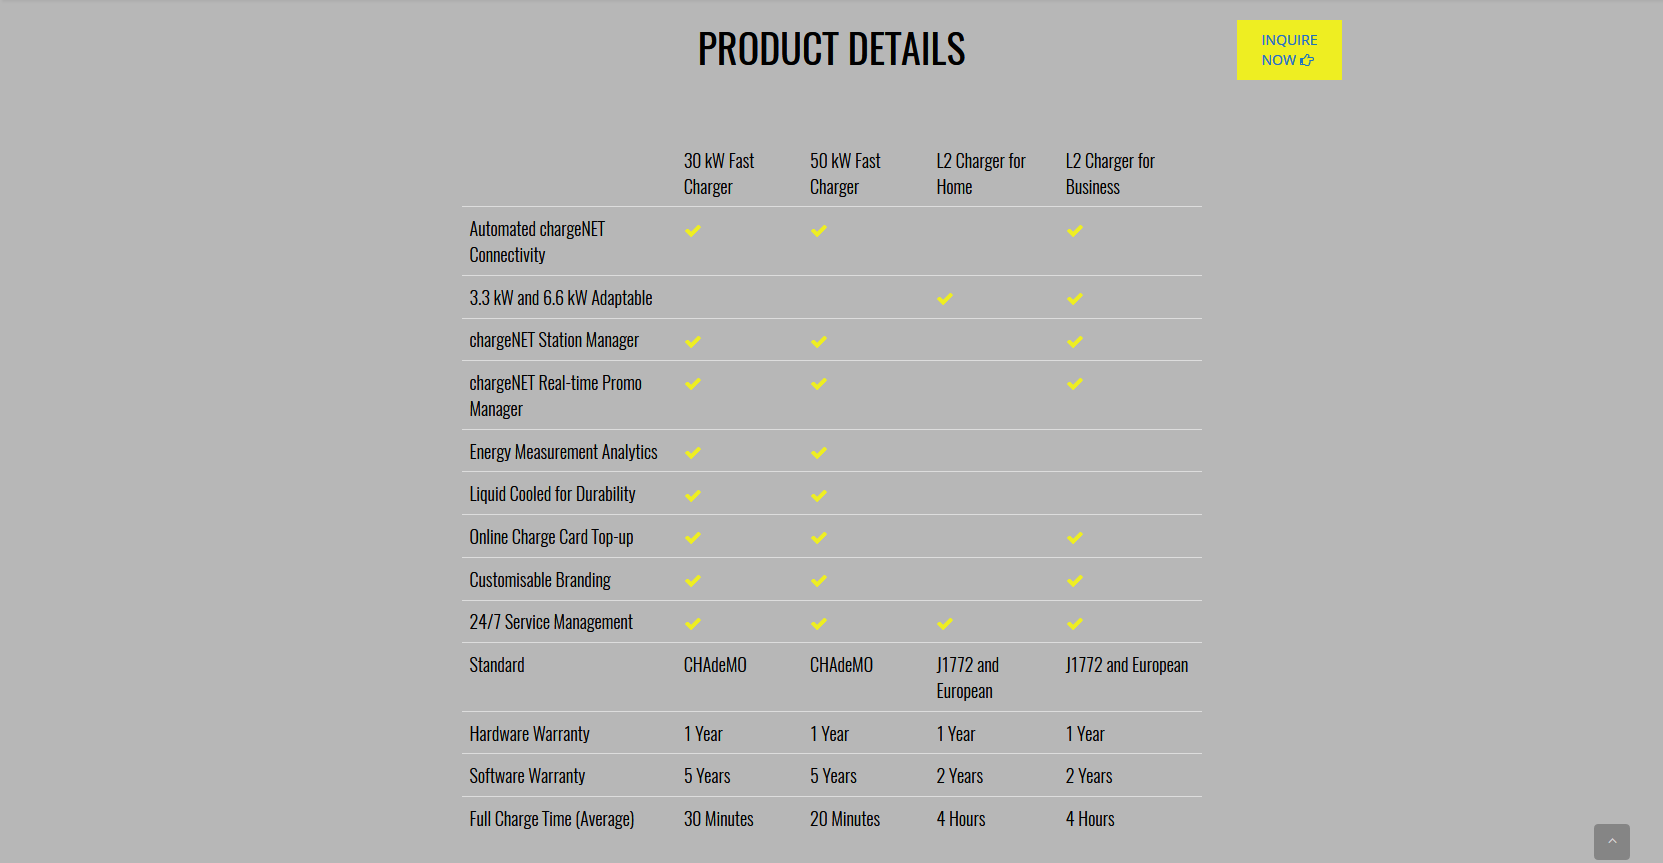 chargeNET - Details